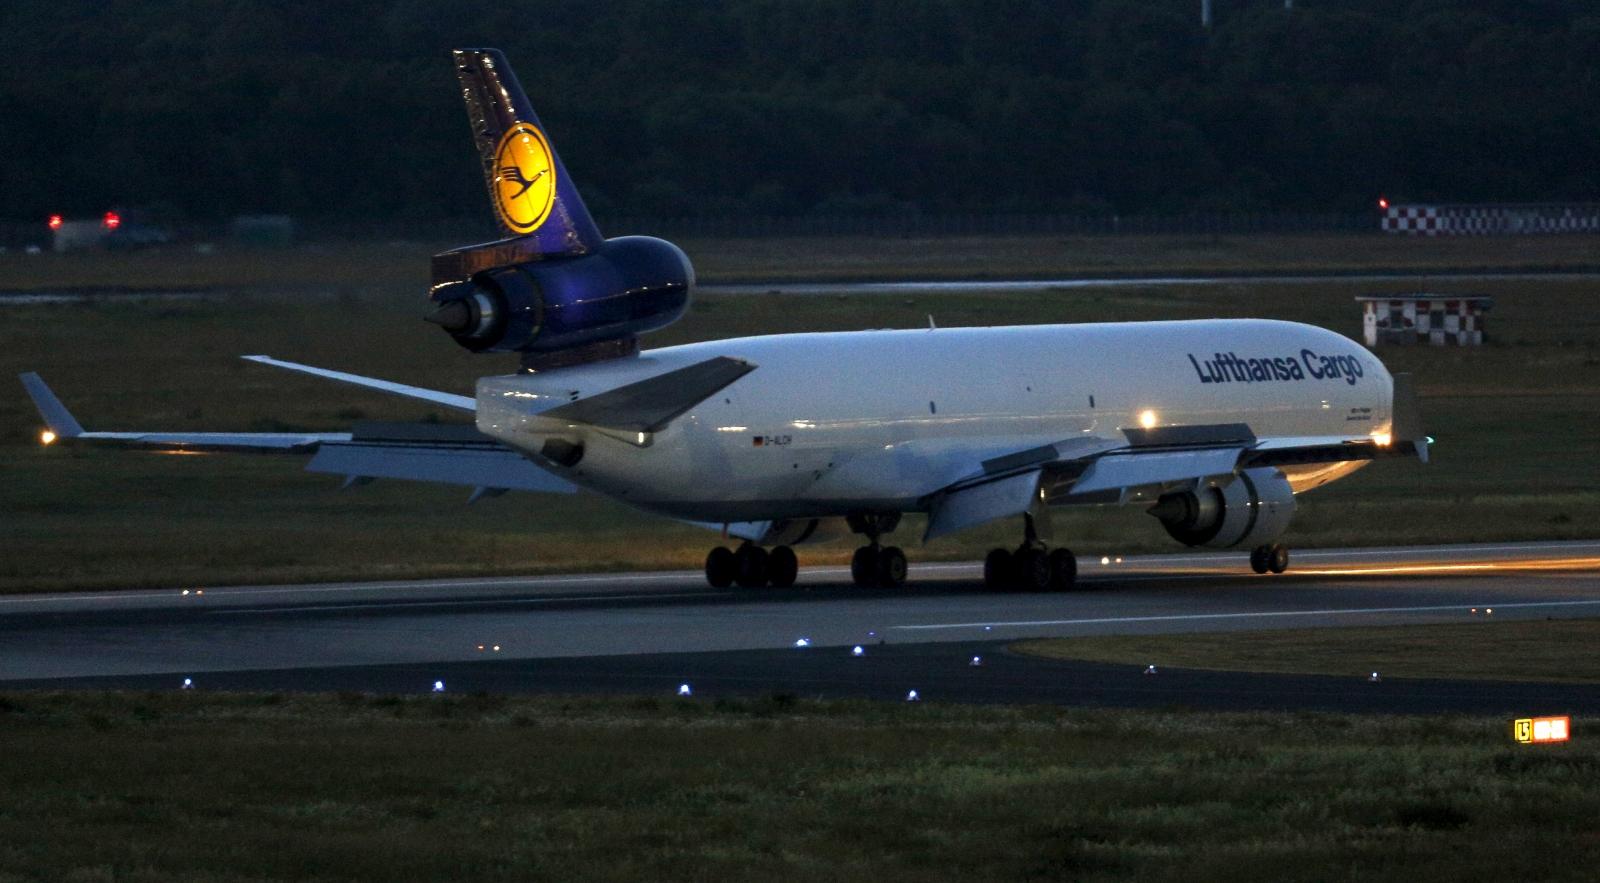 Lufthansa returns bodies from Germanwings crash